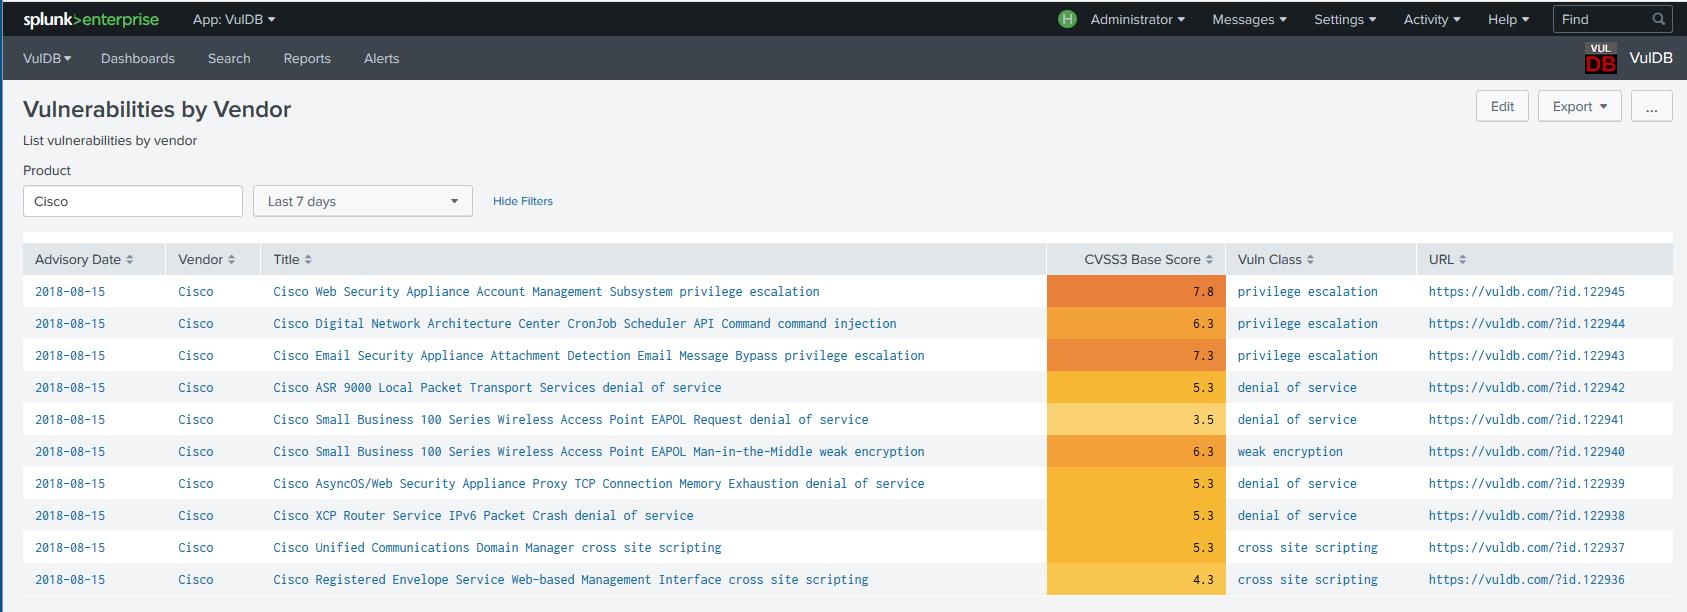 VulDB Splunk App